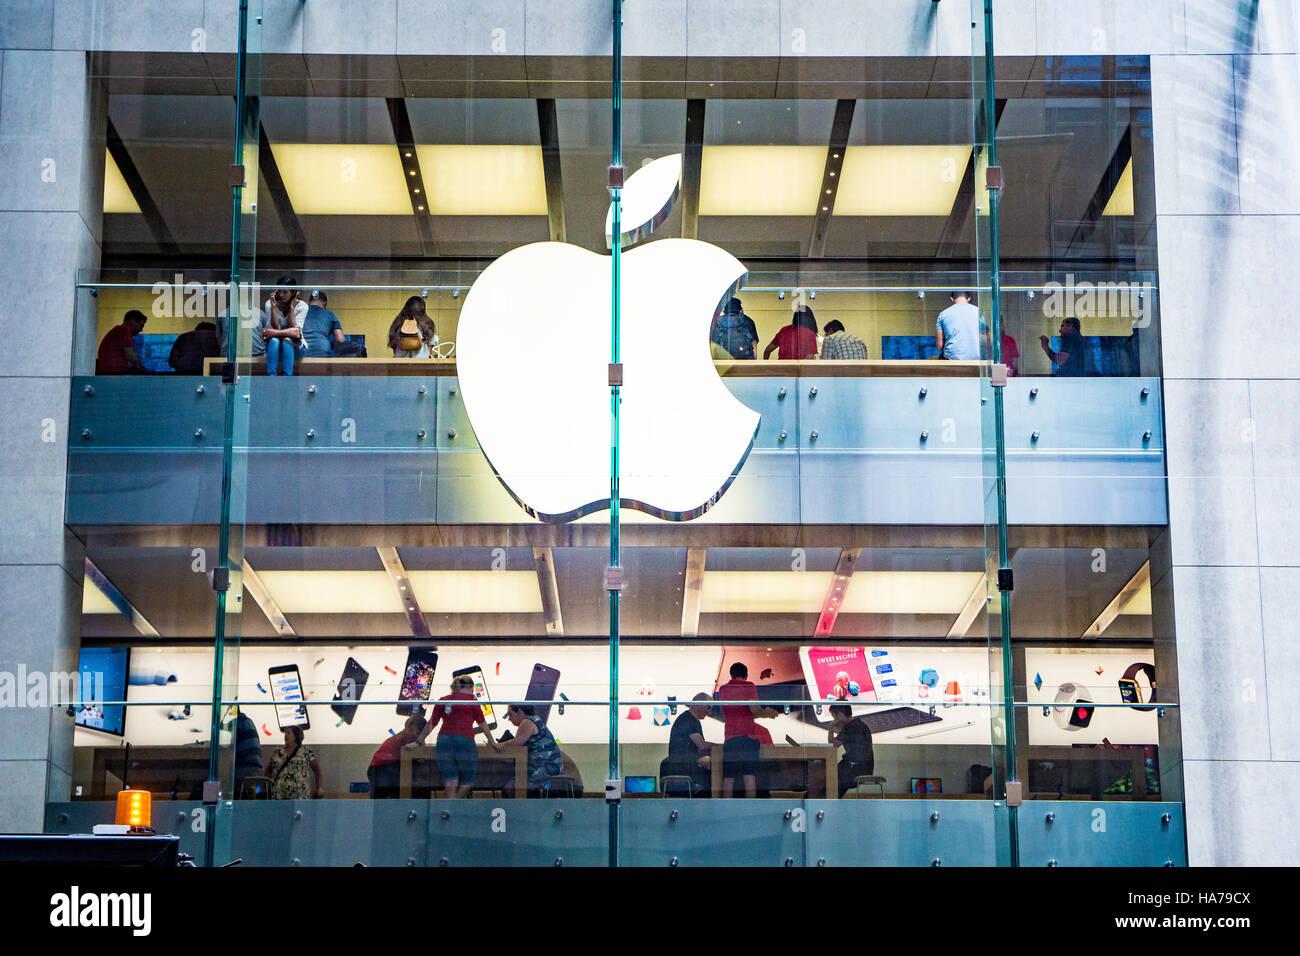 The flagship Apple Store in Sydney, Australia - Stock Image